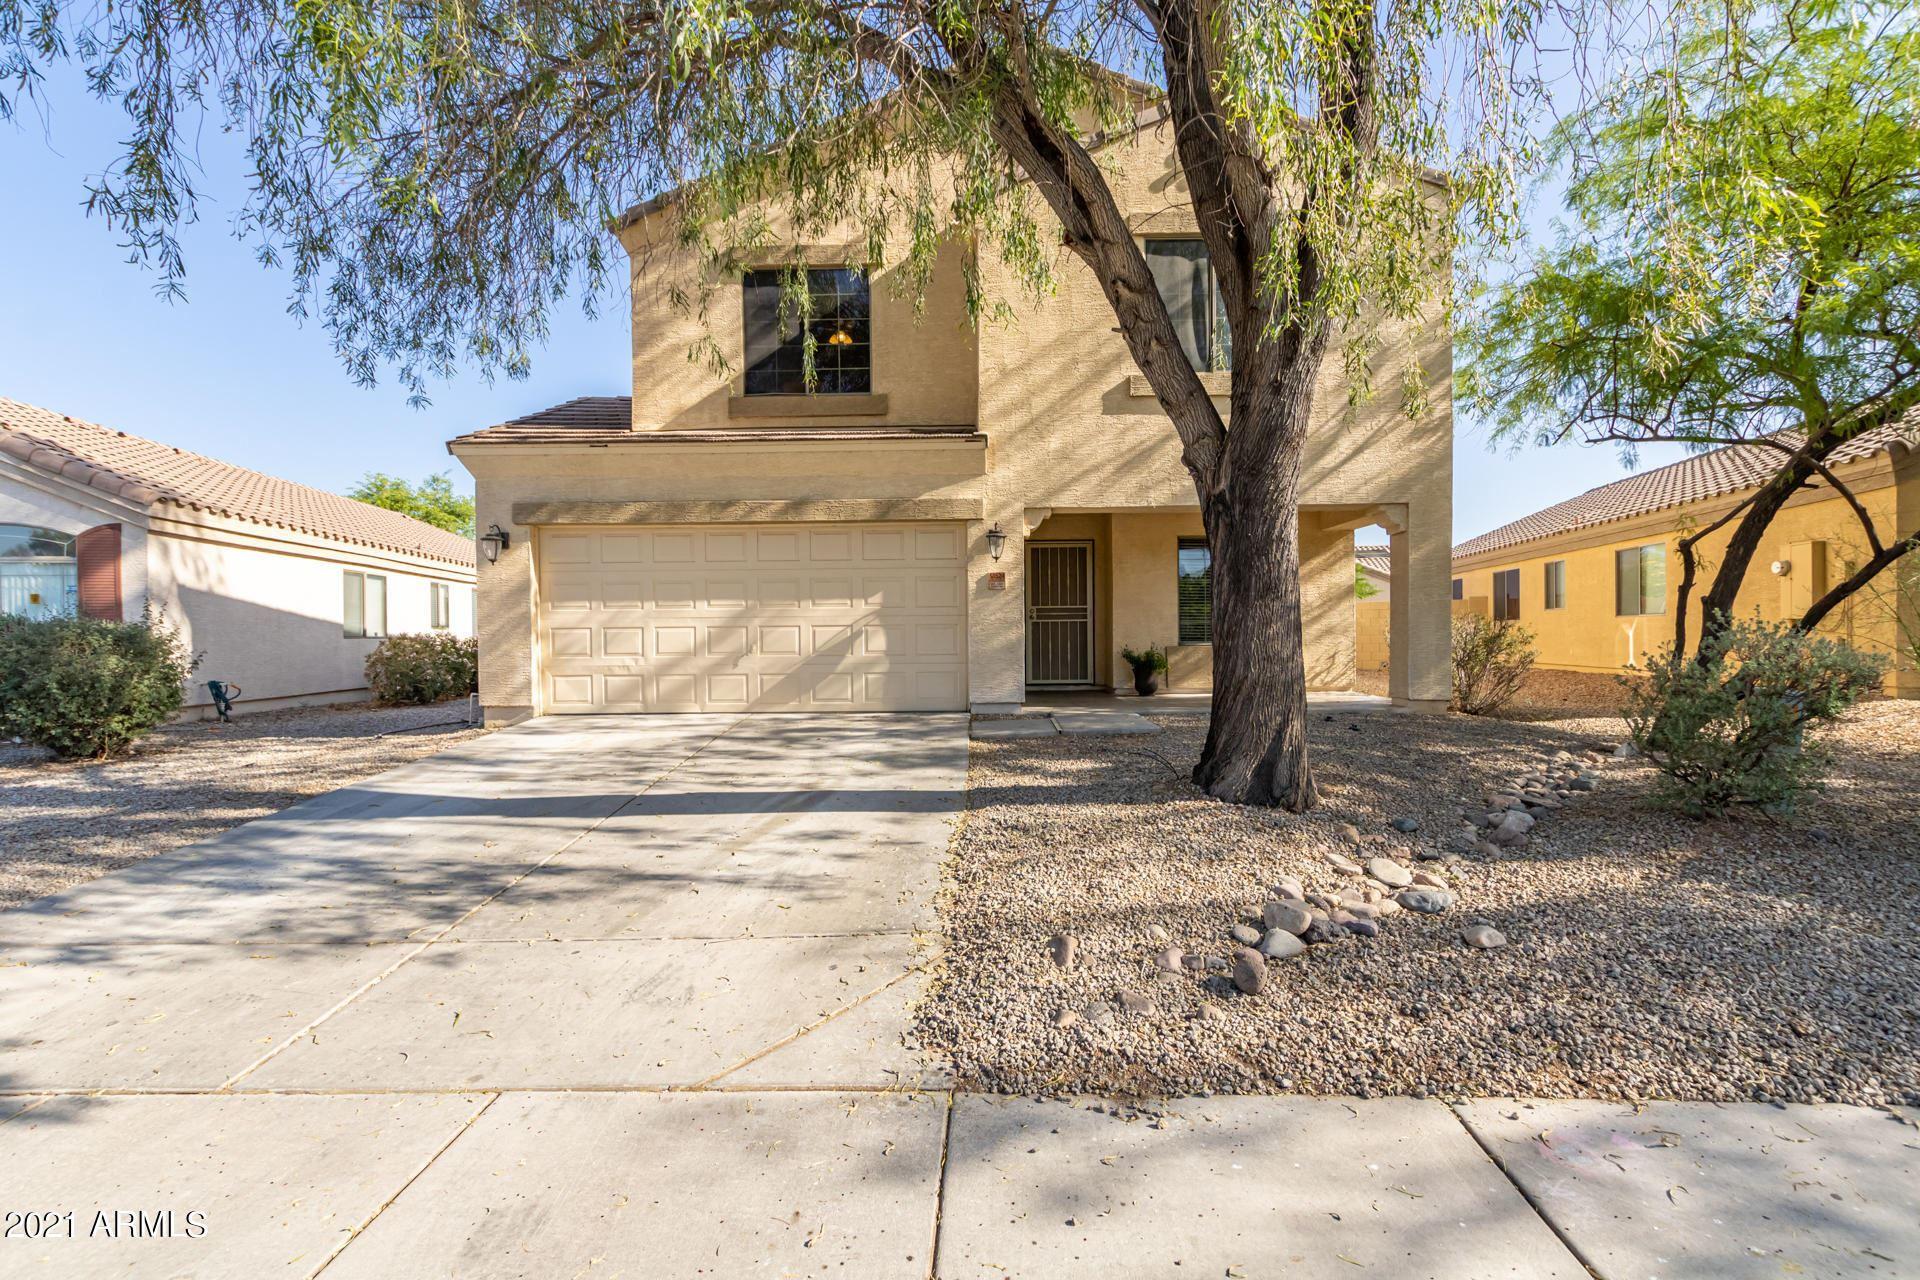 10524 W PIMA Street, Tolleson, AZ 85353 - MLS#: 6236679